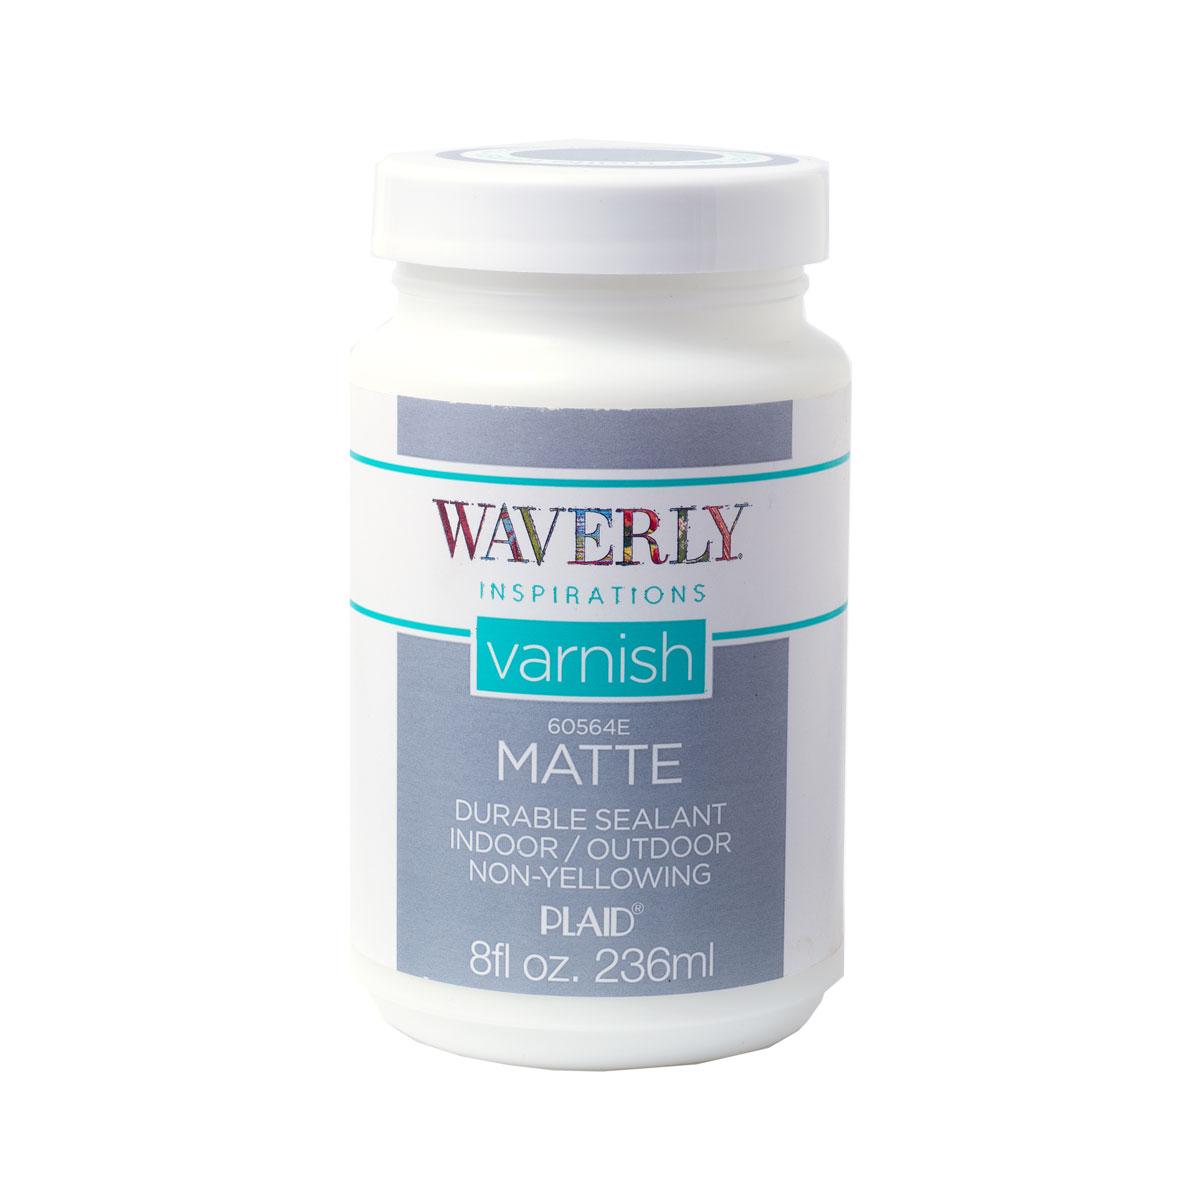 Waverly ® Inspirations Varnish - Matte, 8 oz. - 60564E